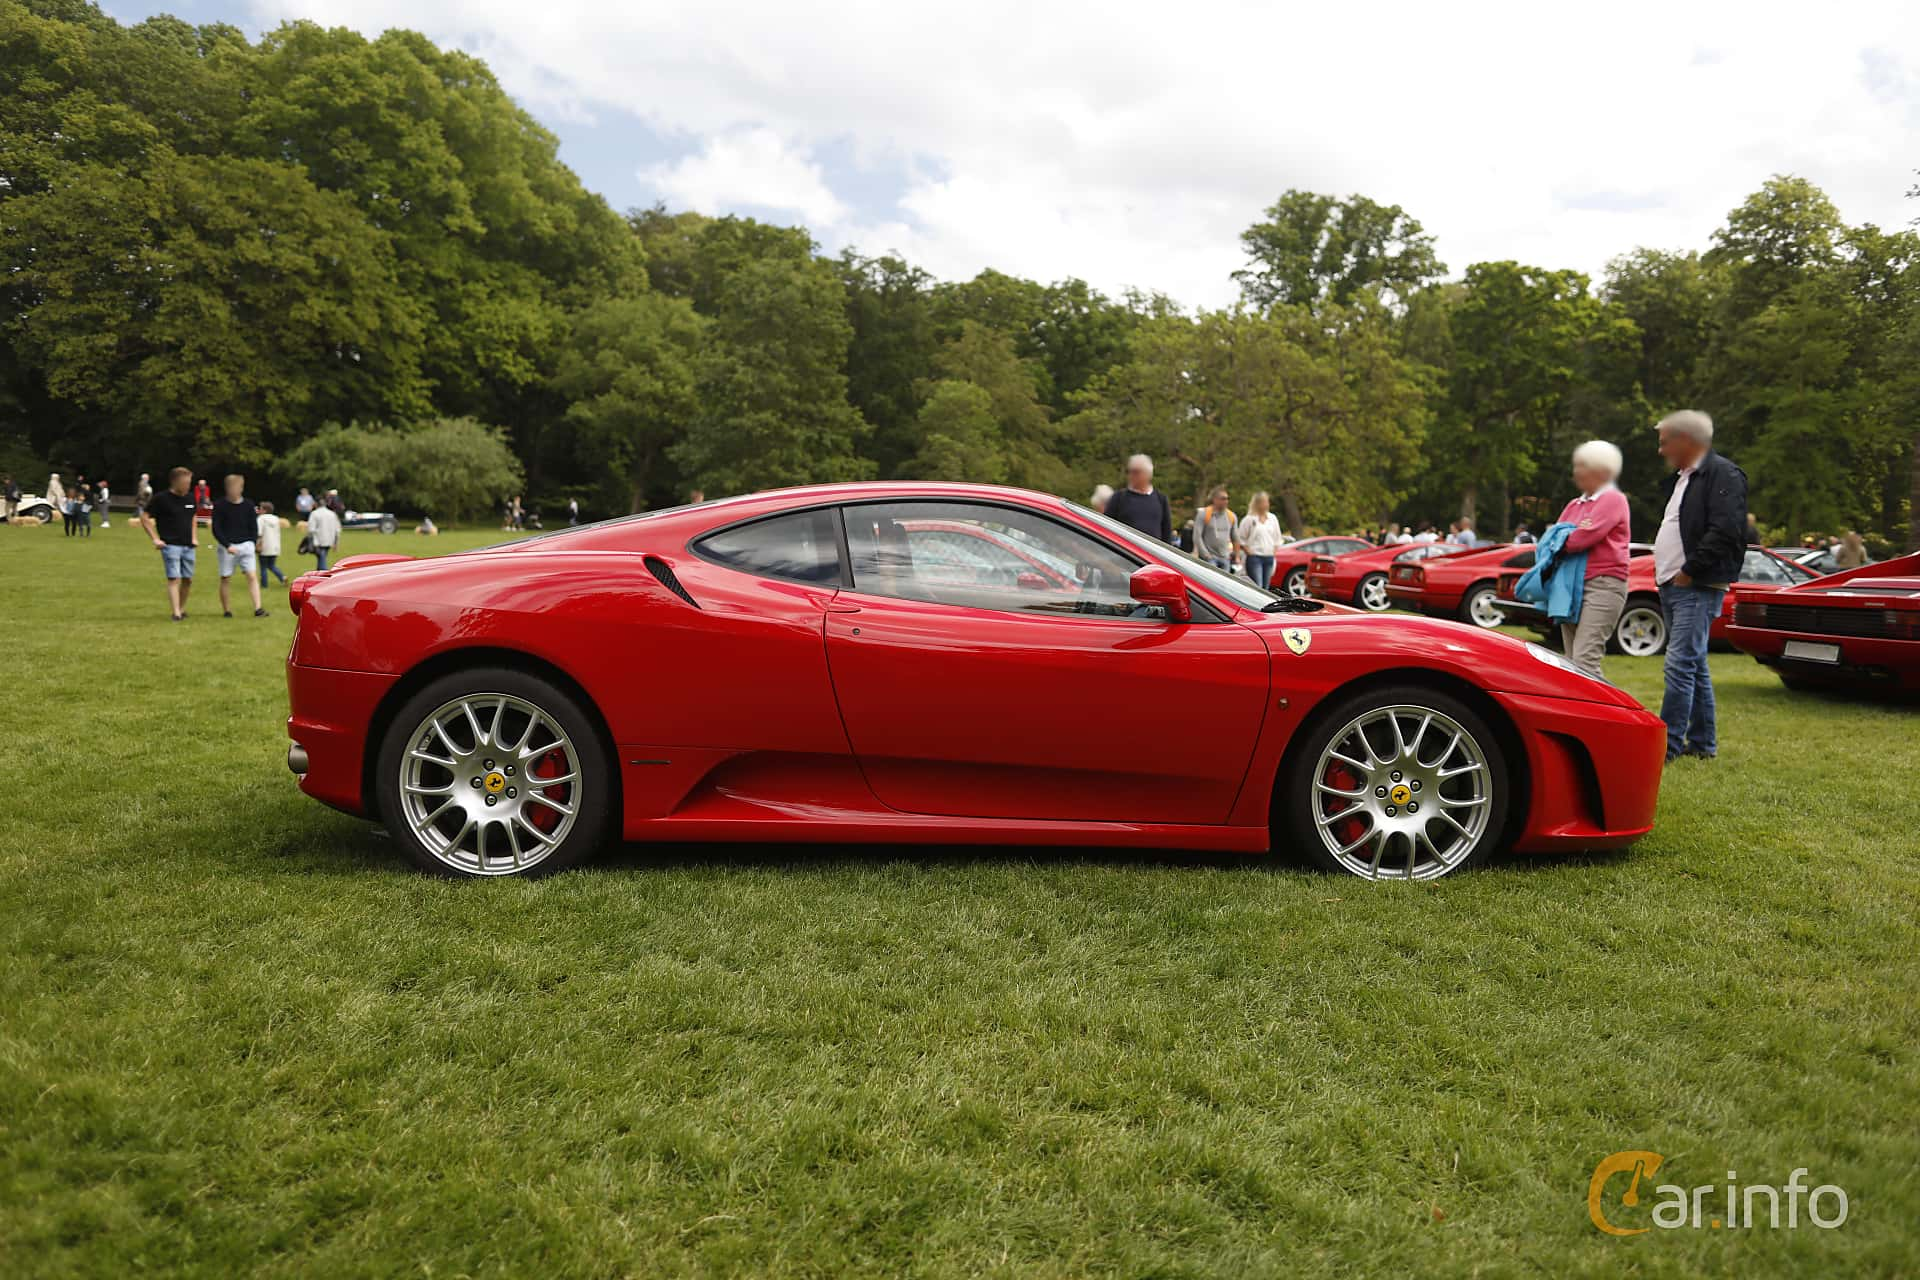 Ferrari F430 4.3 V8 Manual, 490hp, 2005 at Sofiero Classic 2019